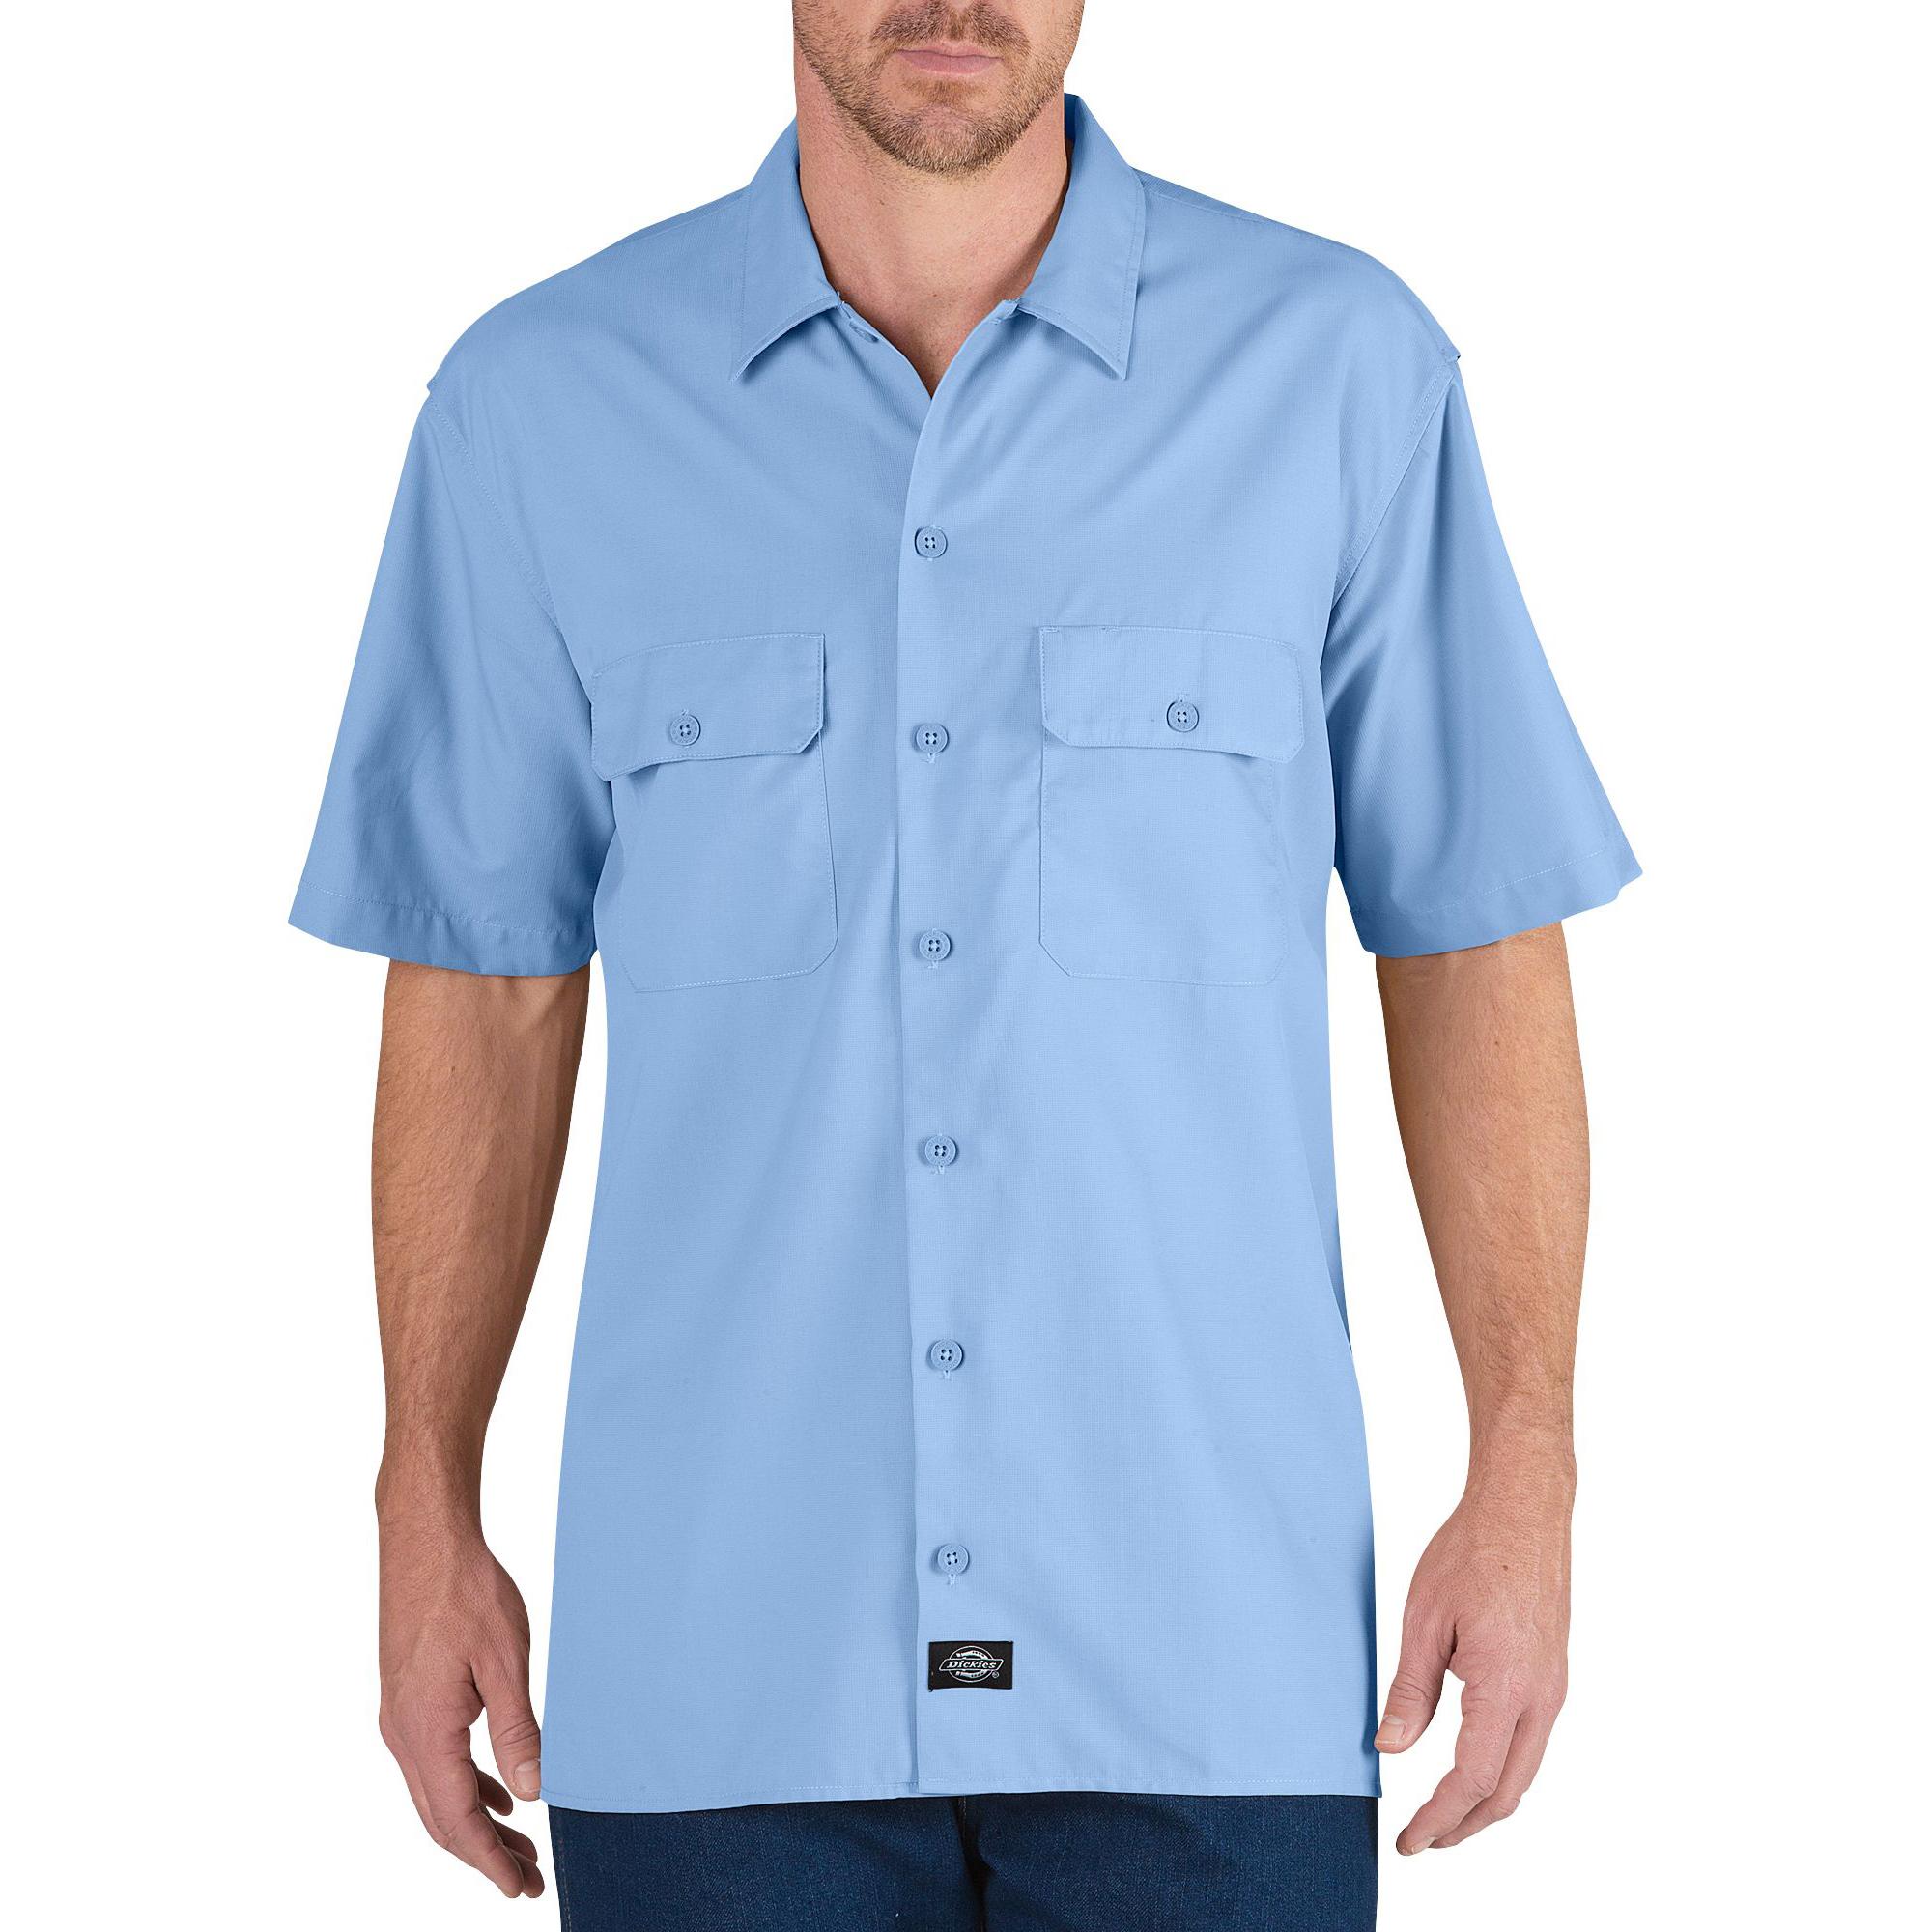 Dickies SS300 Men's Performance Short Sleeve Comfort Shirt at Sears.com